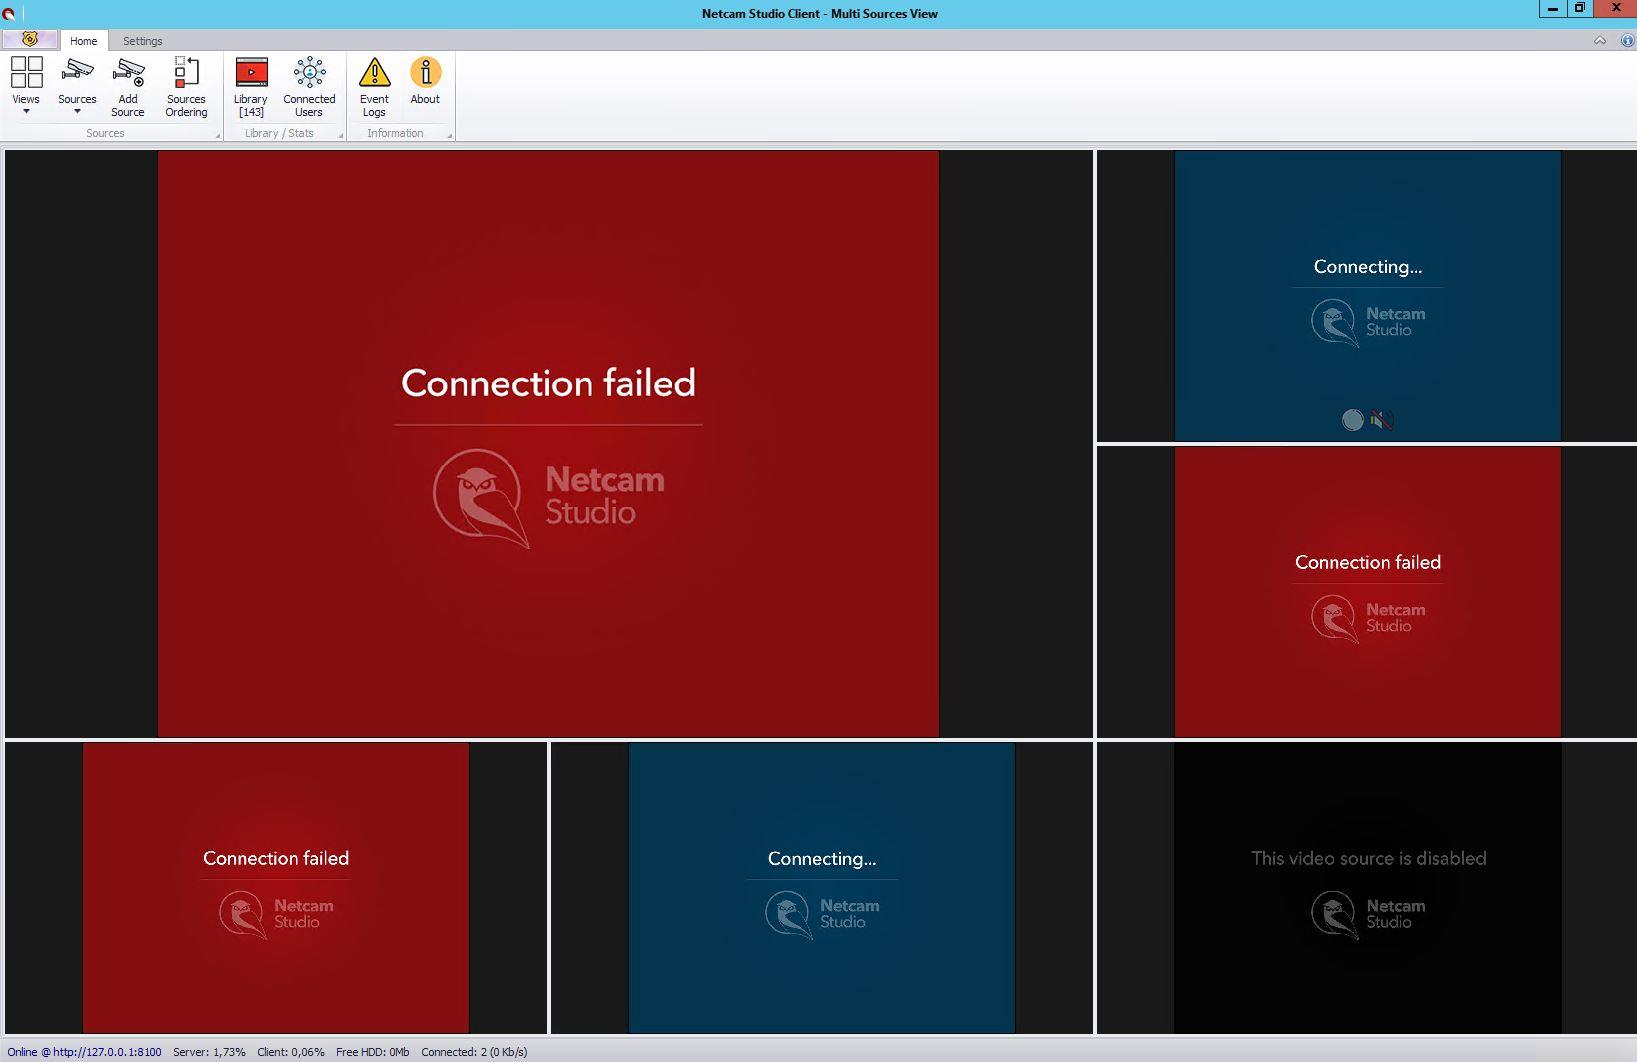 Custom URL not working - Problems & Bugs - Moonware Studios